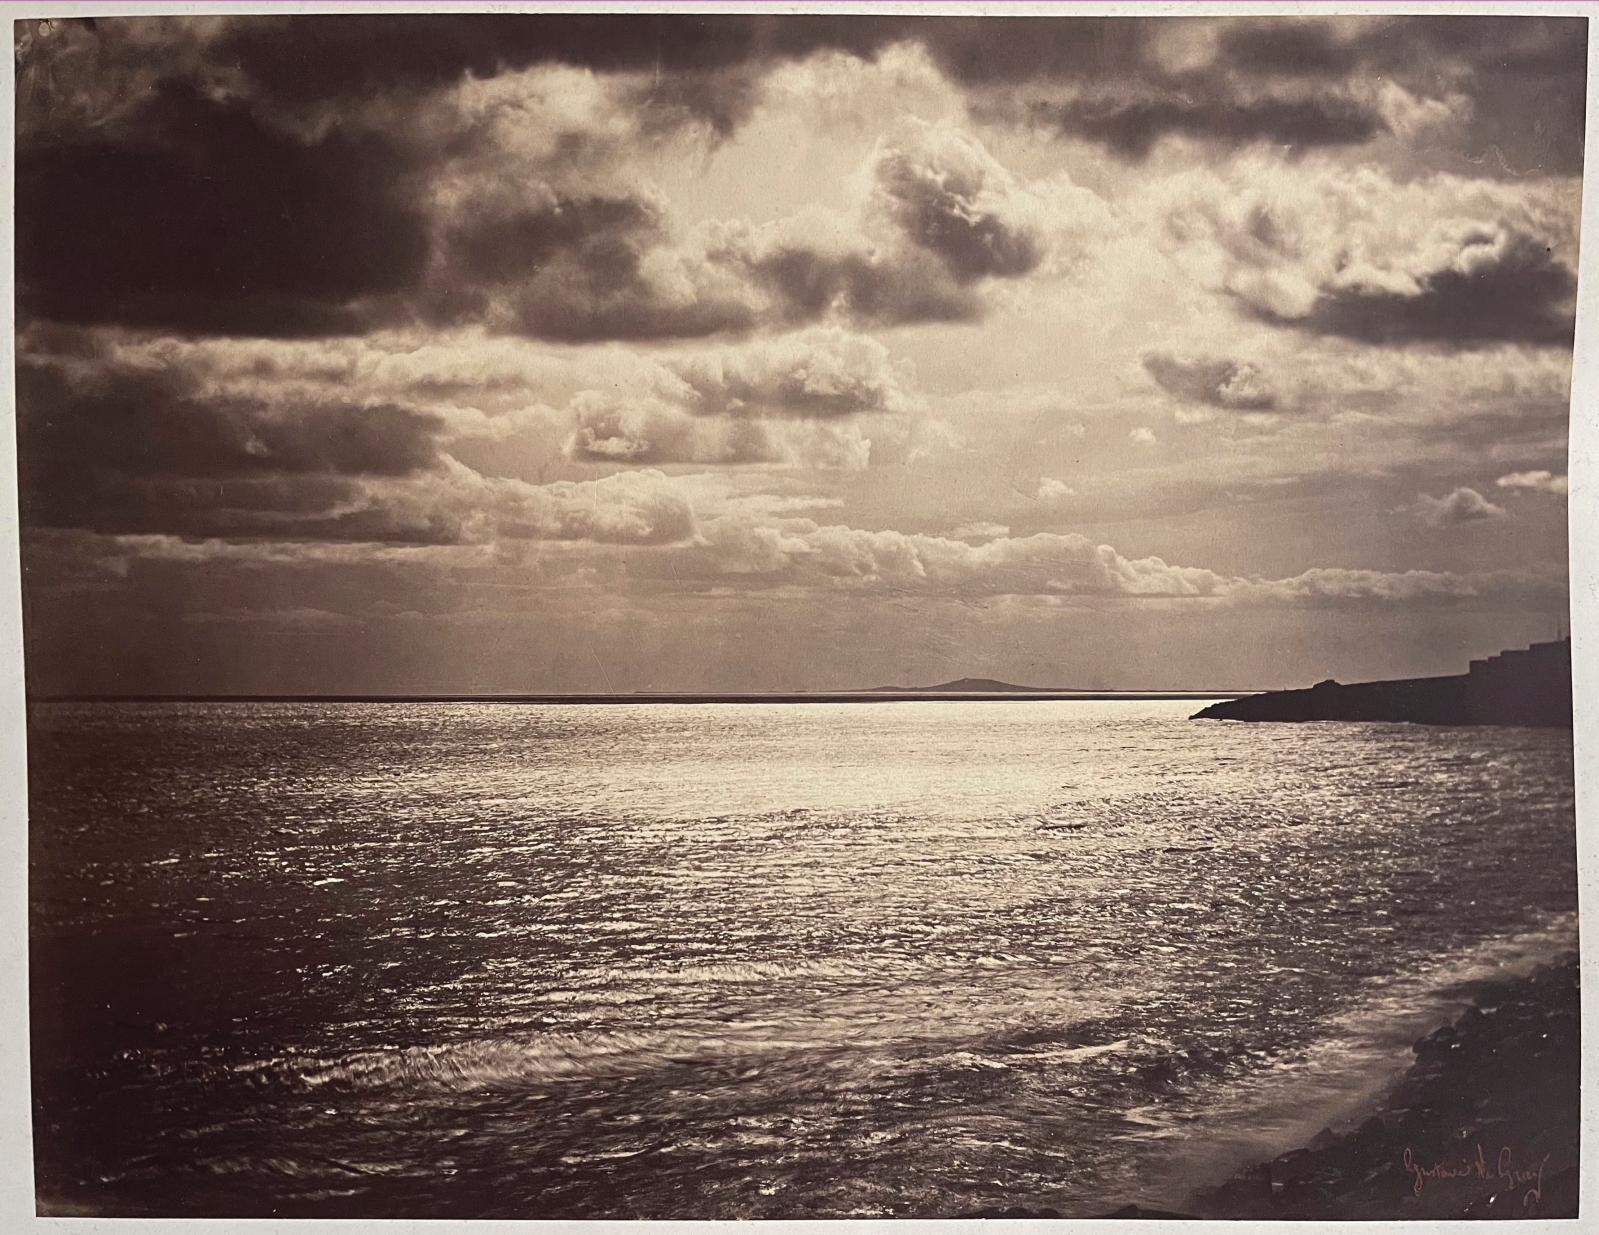 Gustave Le Gray (1820–1884), La Mer Méditerranée à Cette [Sète] (The Mediterranean Sea at Cette [Sète]), 1857, albumin print, red signature stamp and dry stamp on the mount, label with the title, 32.1 x 41.7 cm/12.64 x 16.42 in. Estimate: €15,000/20,000